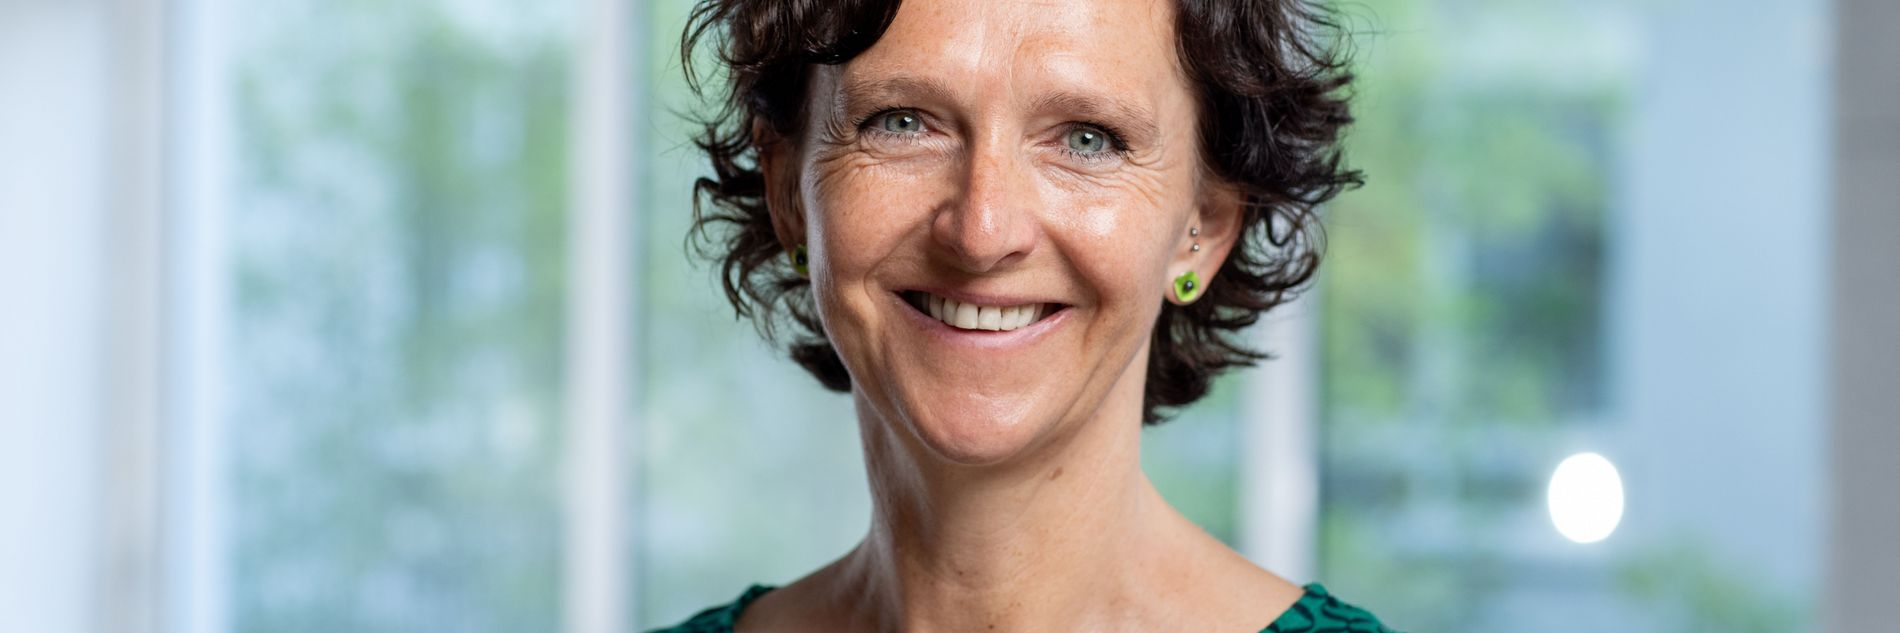 Dr. med. Jolanda Daniuk